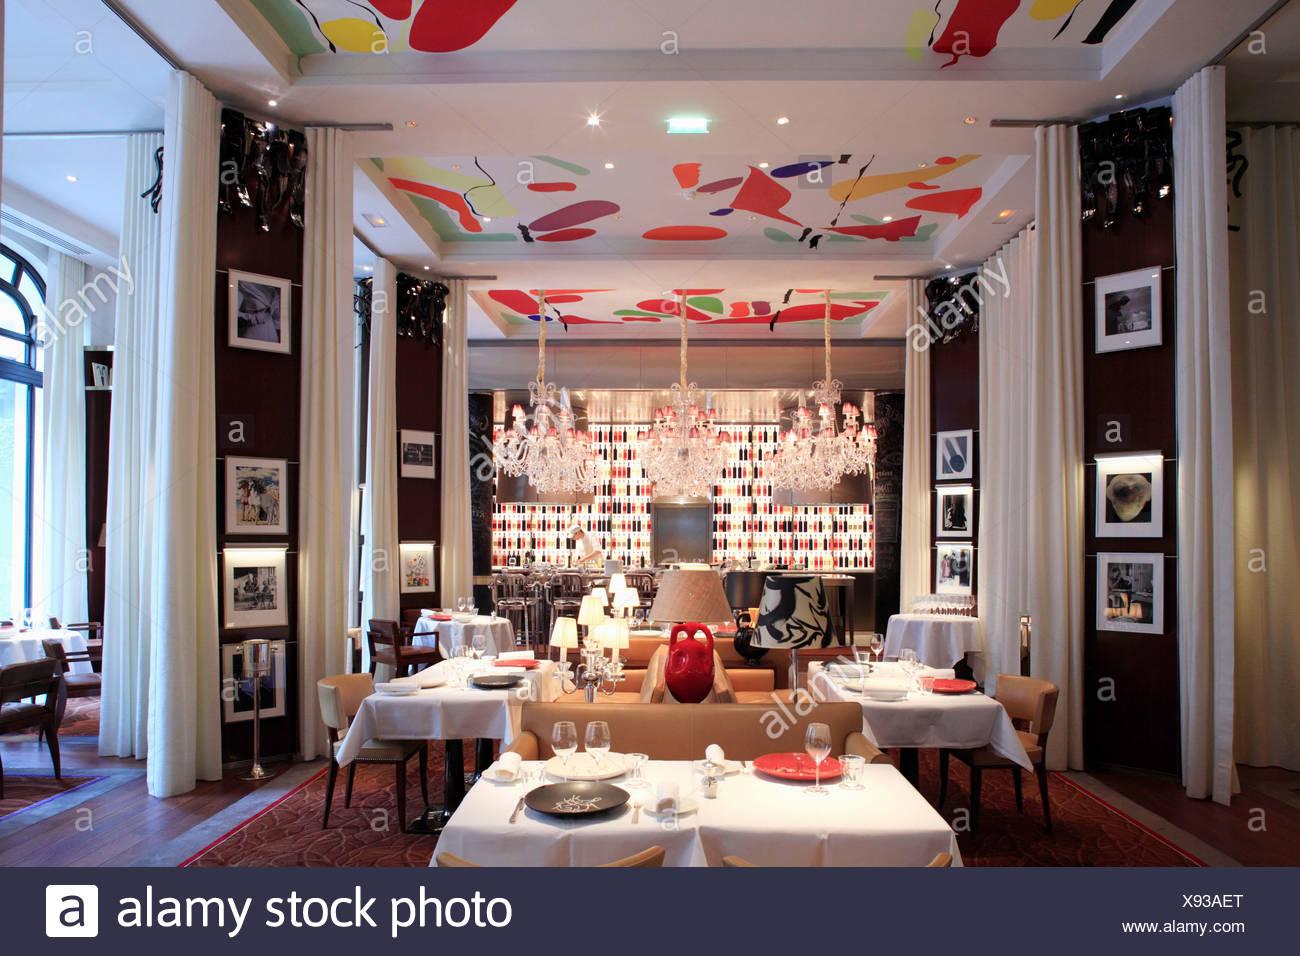 Philippe starck stock photos philippe starck stock images alamy - La cuisine hotel royal monceau ...